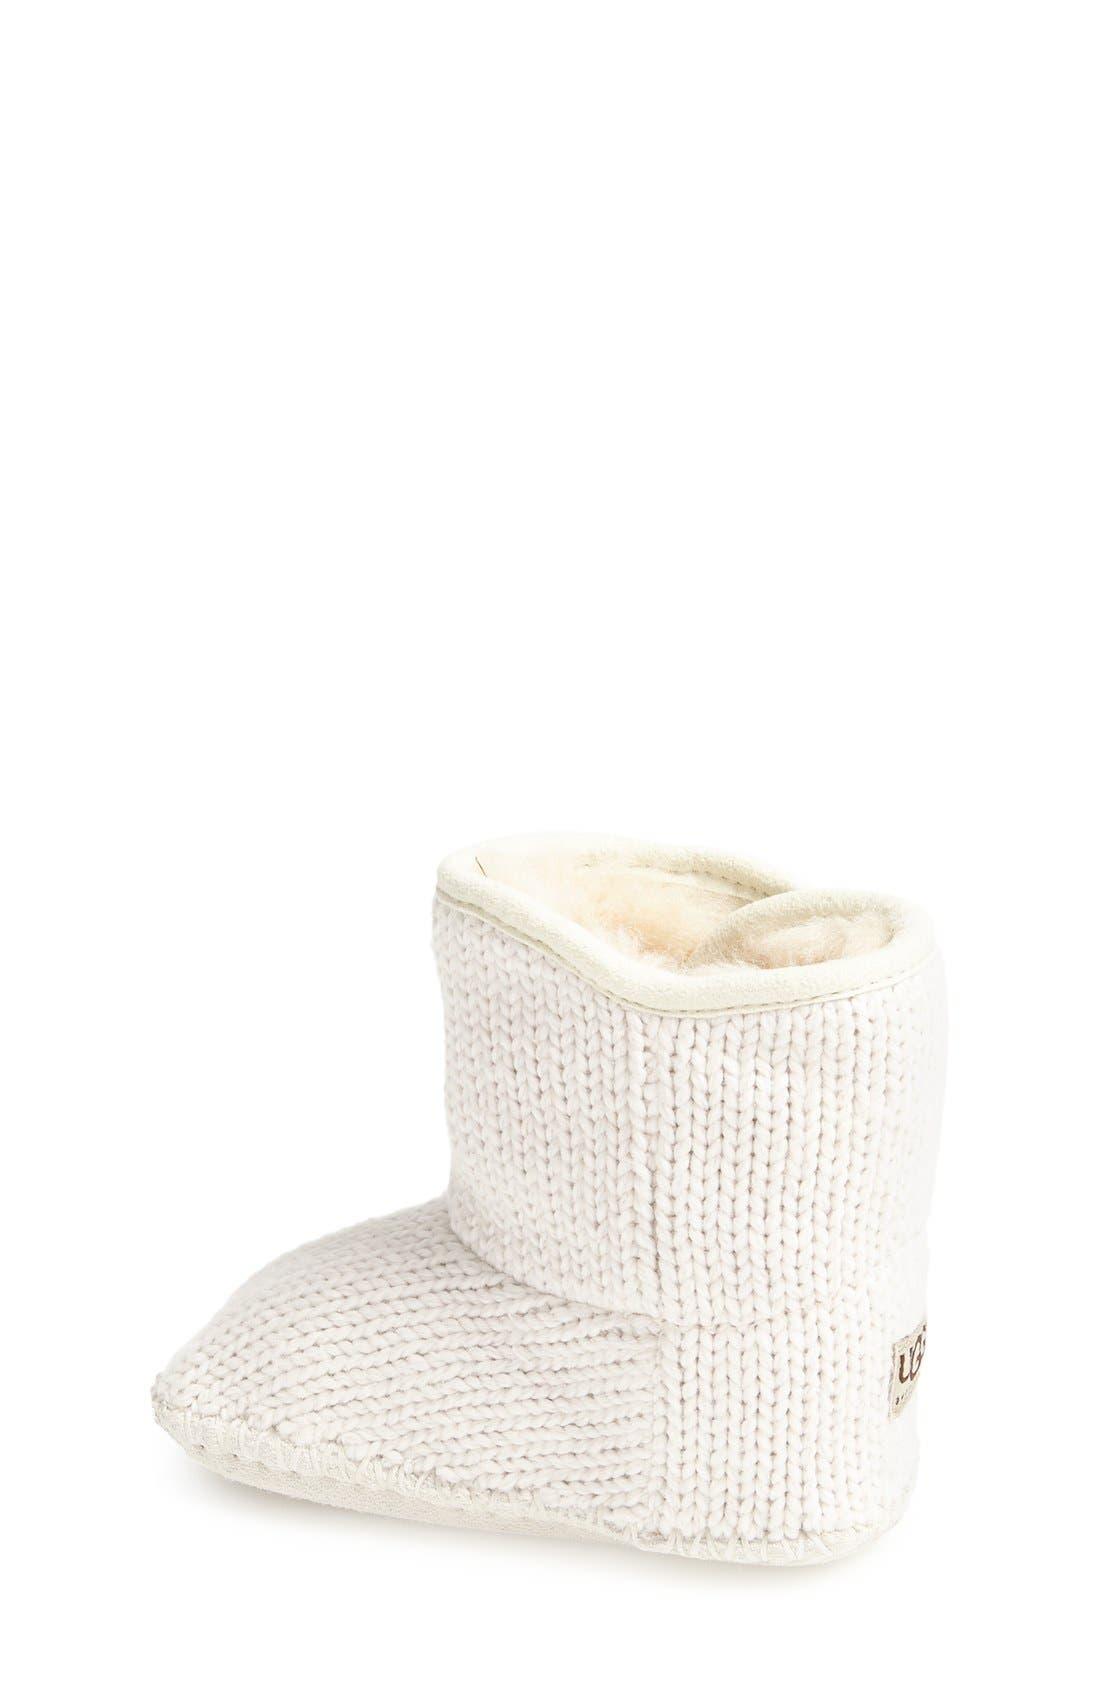 Purl Knit Bootie,                             Alternate thumbnail 3, color,                             924